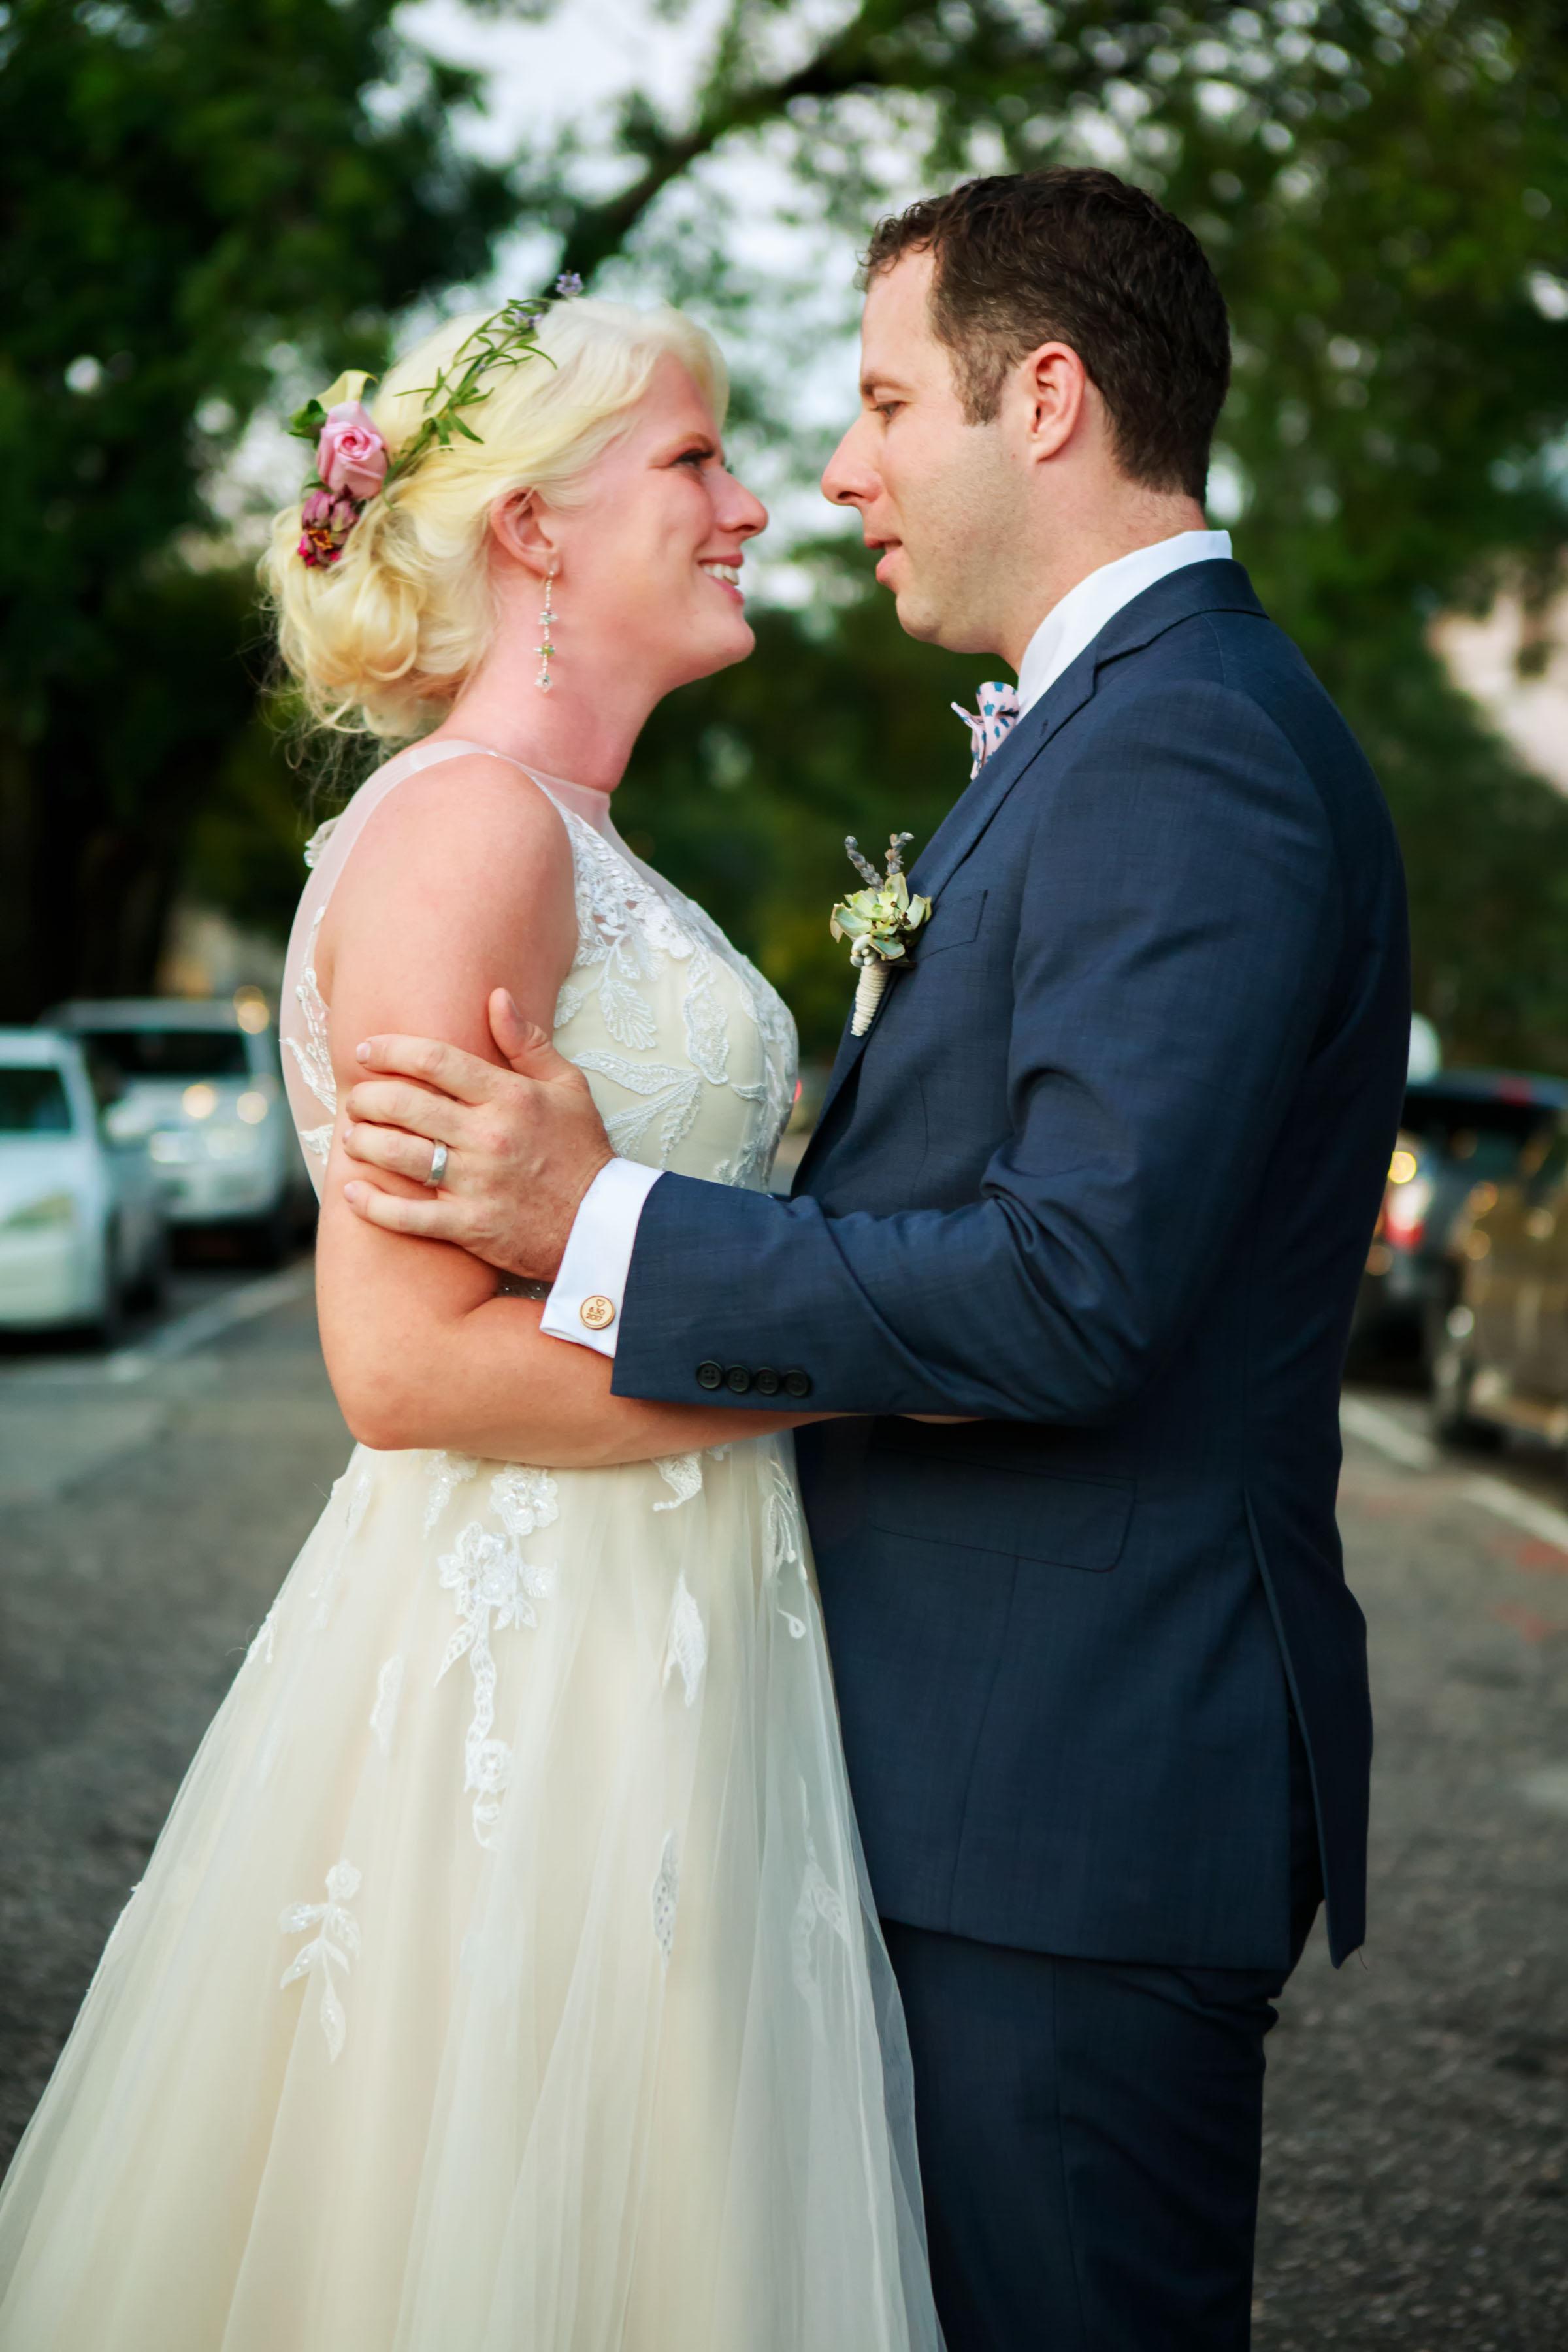 128-South-Wedding-Tiffany-Abruzzo-Photography-Bride-&-Groom-67.jpg